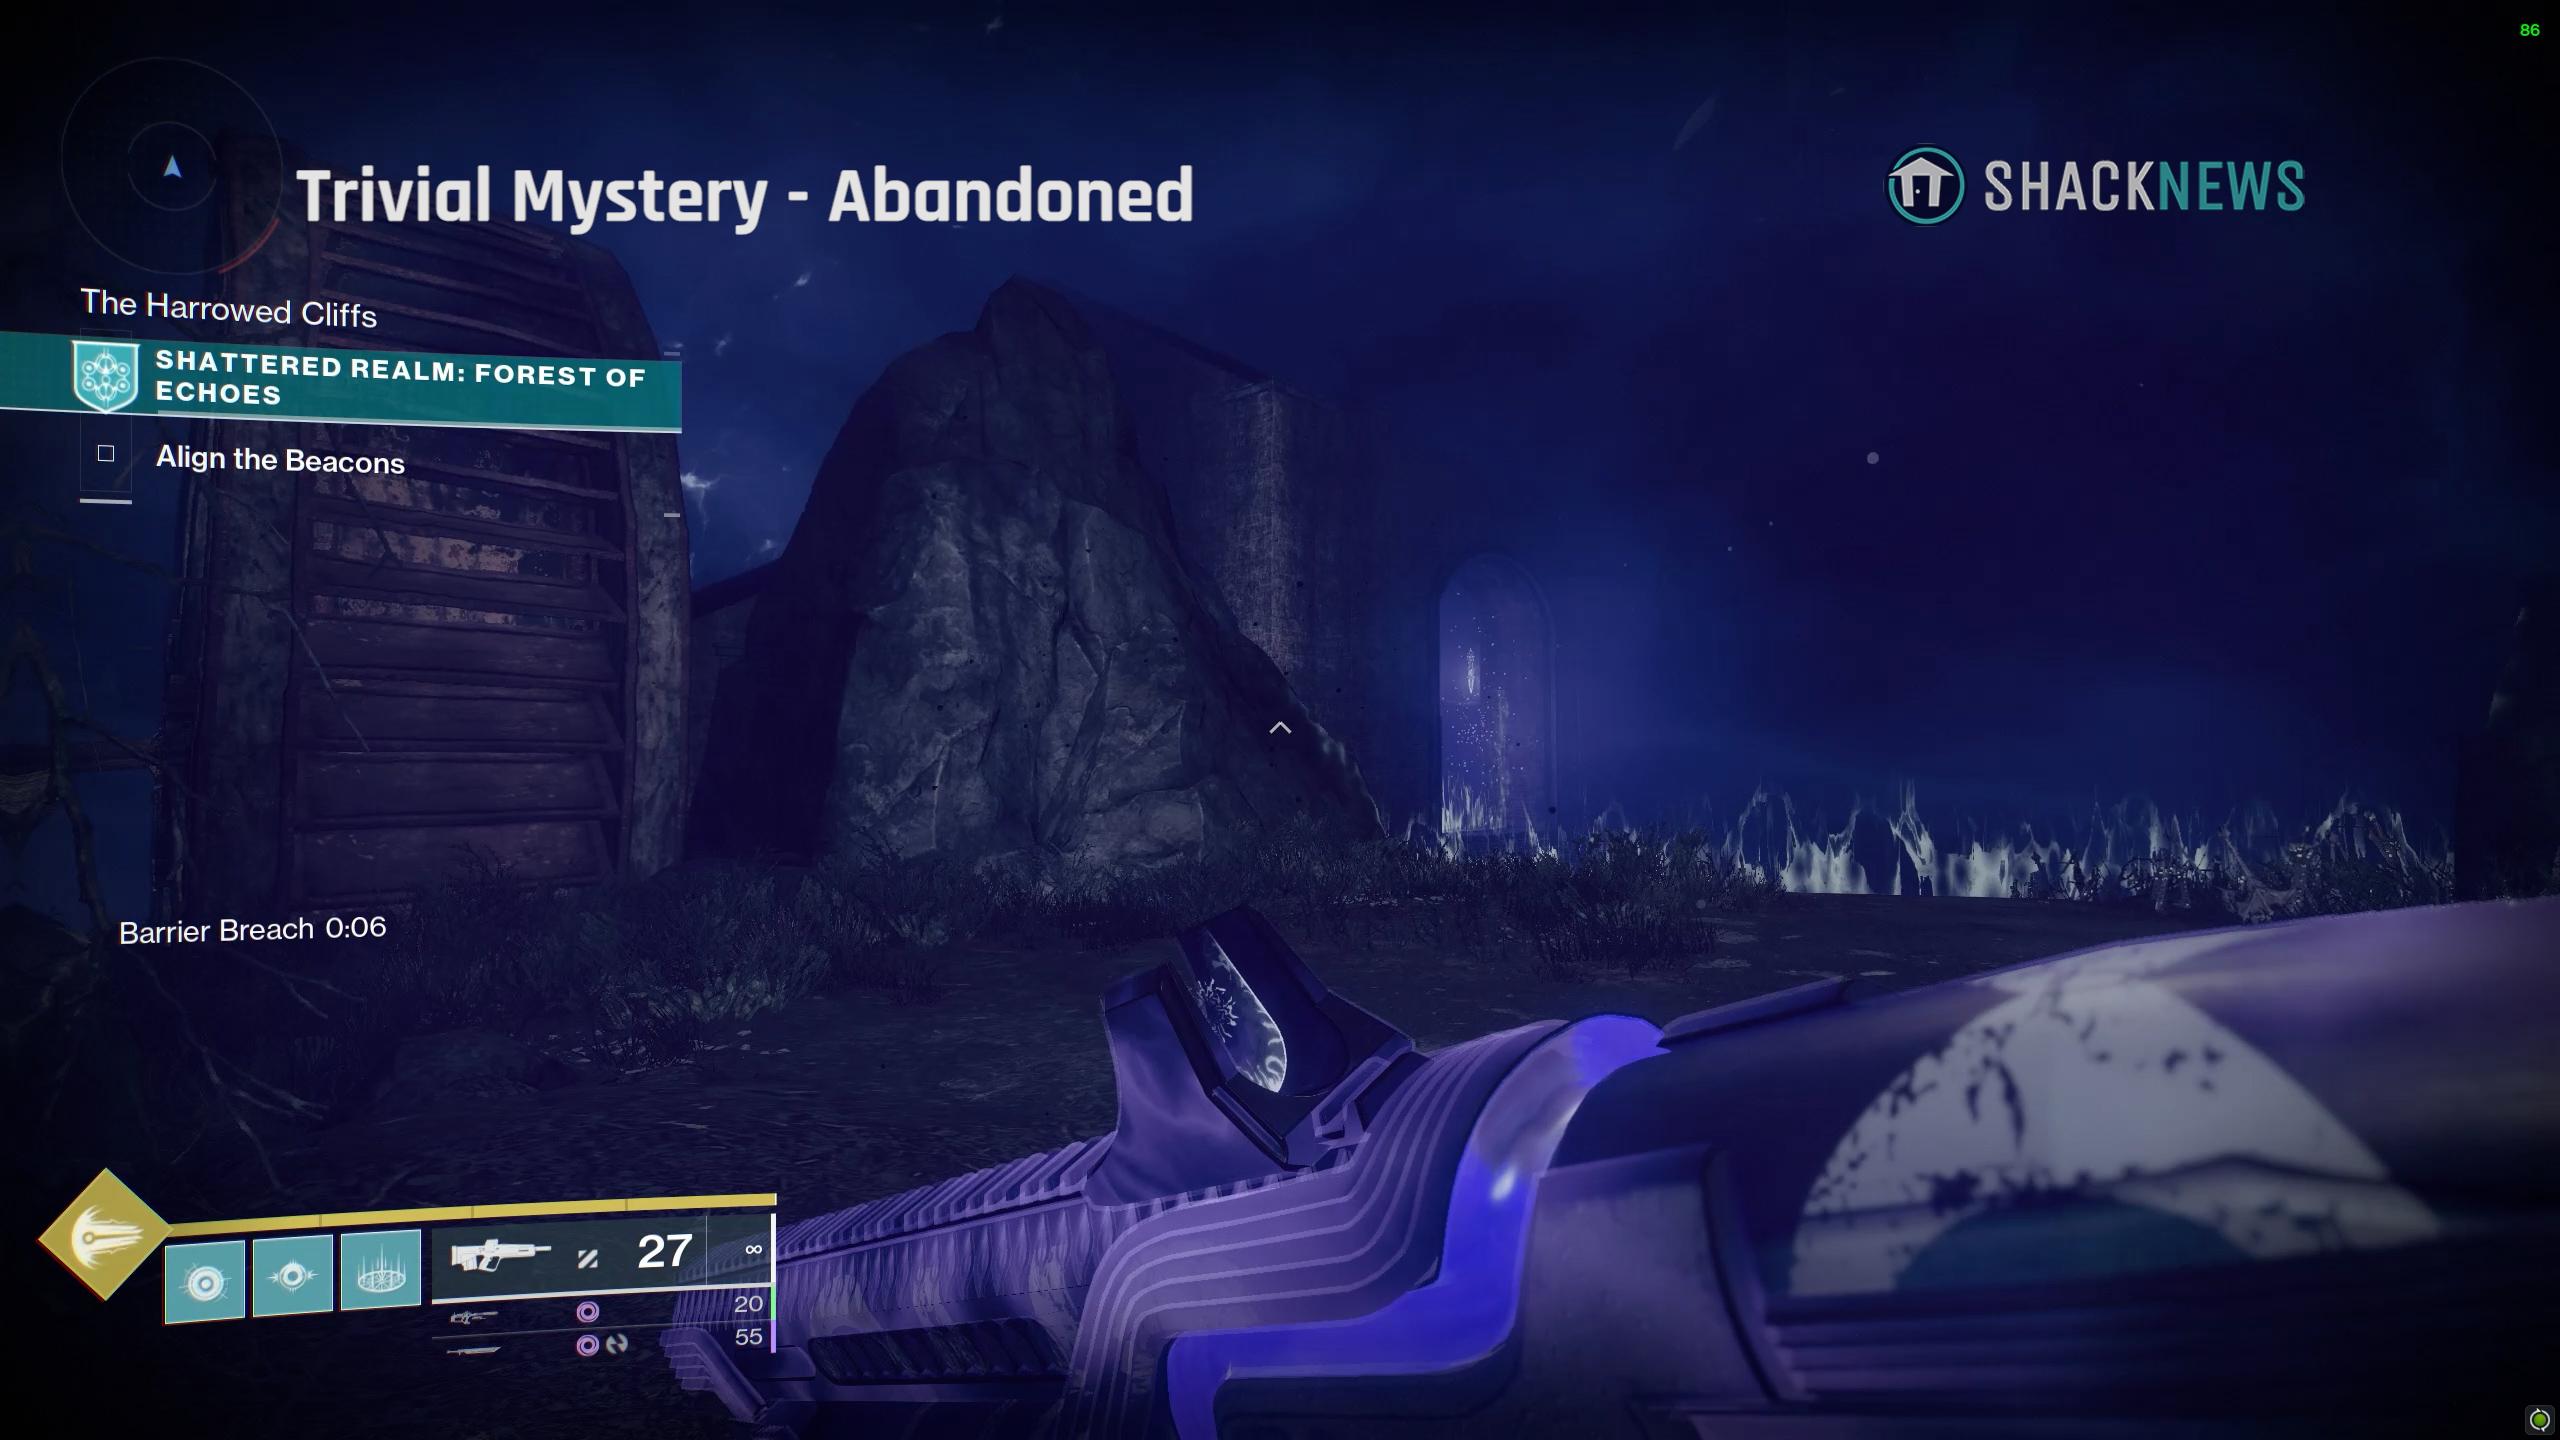 destiny 2 trivial mystery abandoned